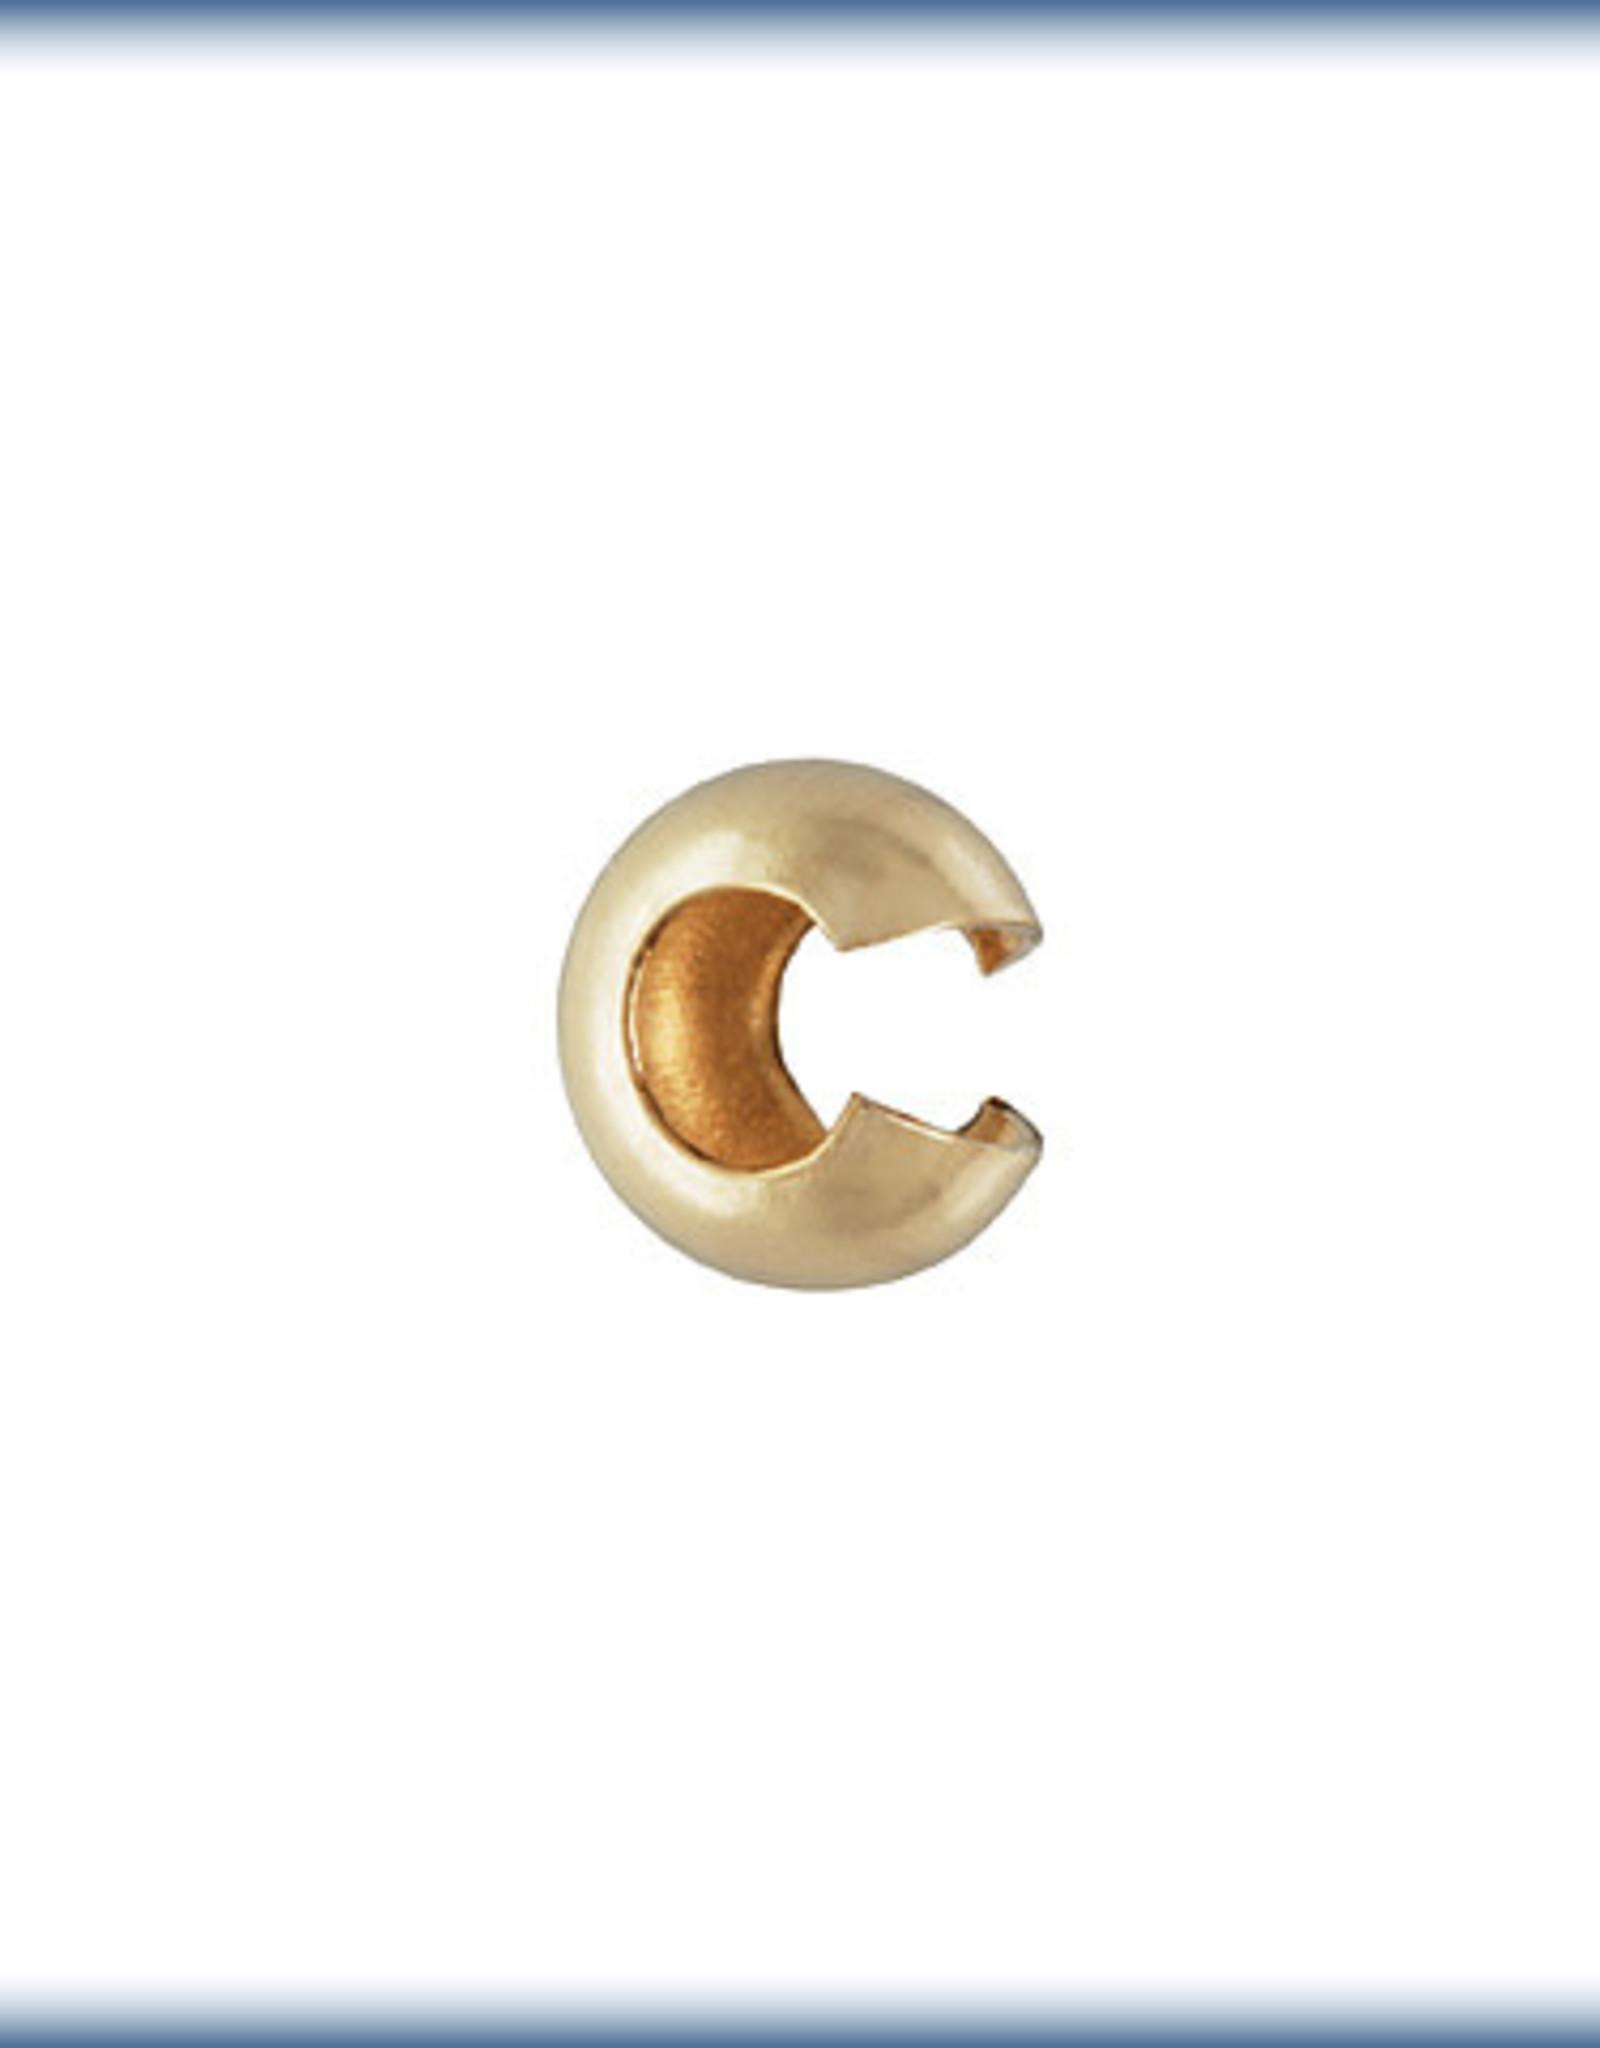 3mm Crimp Covers, 14k Gold Filled Qty 12